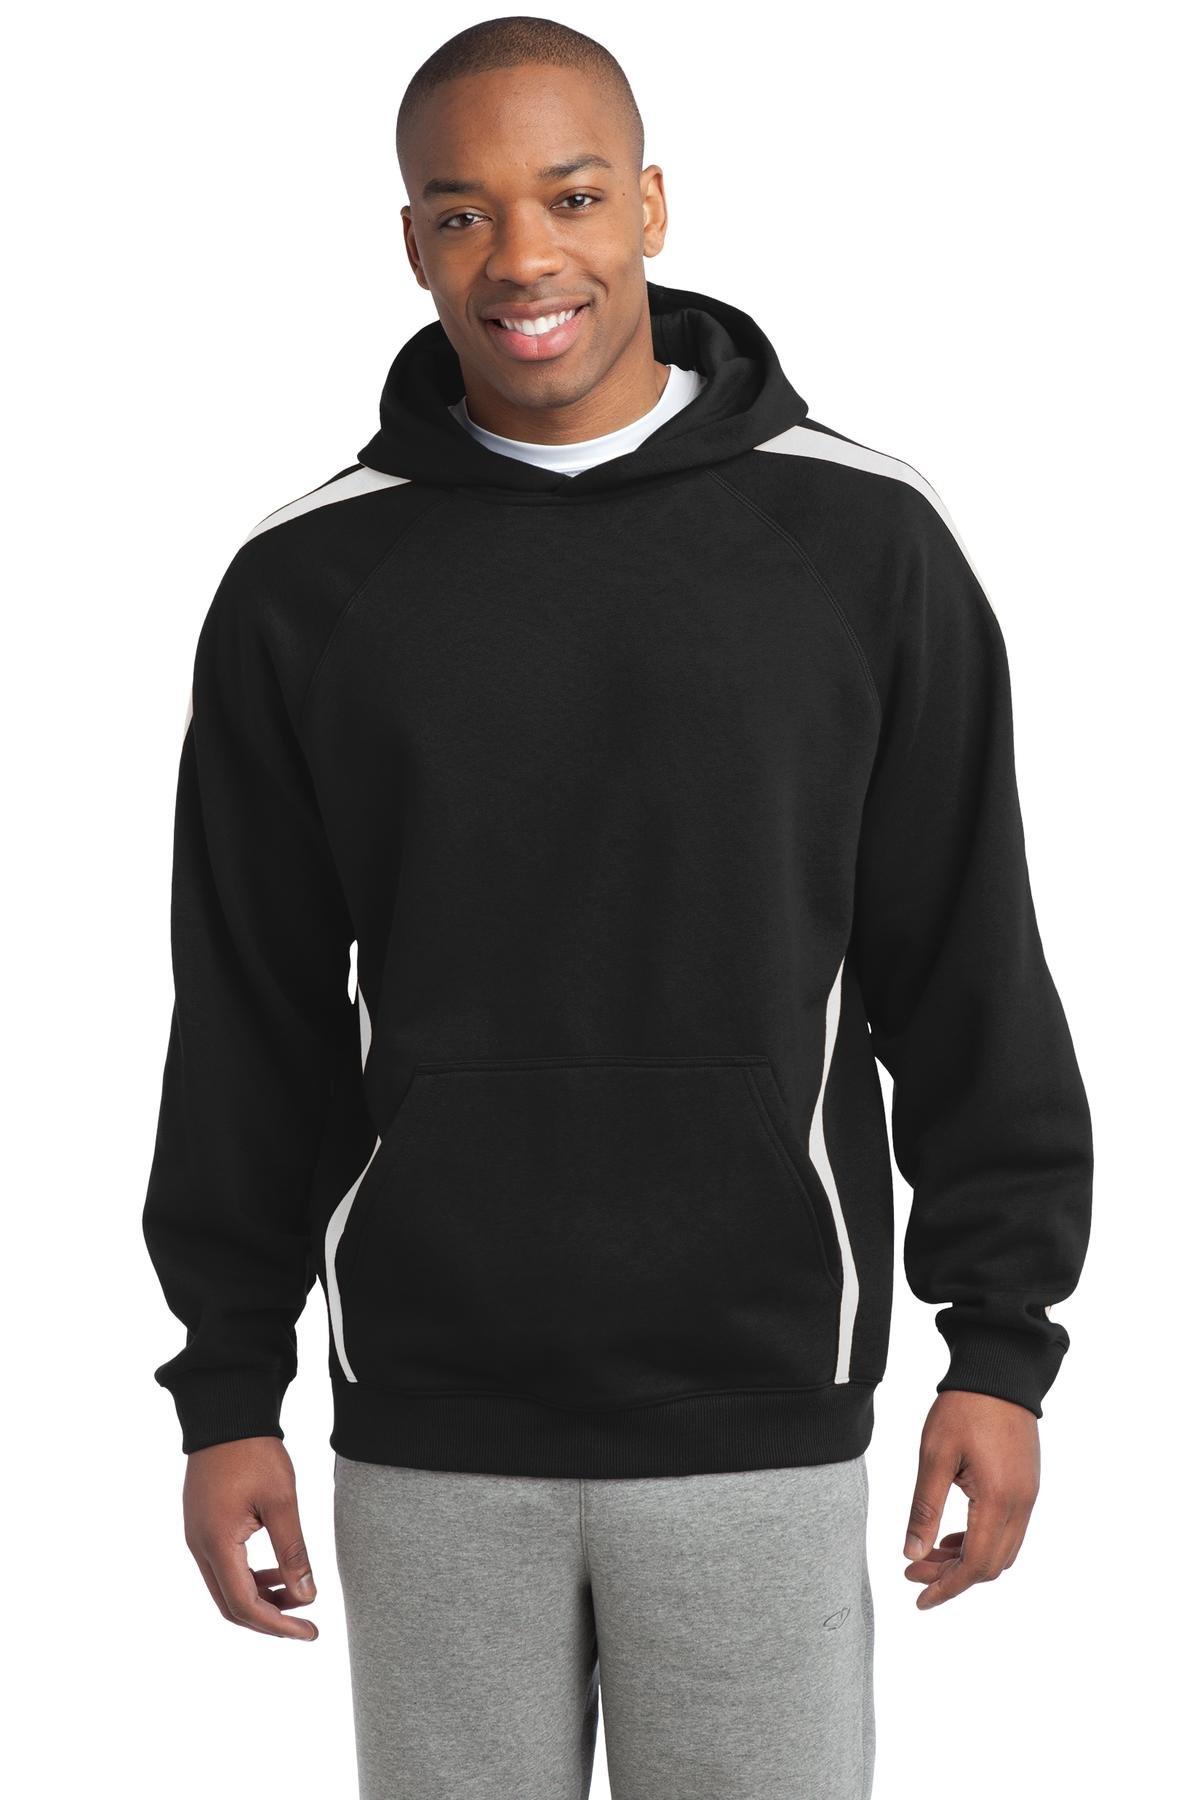 Sport-Tek Men's Sleeve Stripe Pullover Hooded Sweatshirt XL Black/White by Sport-Tek